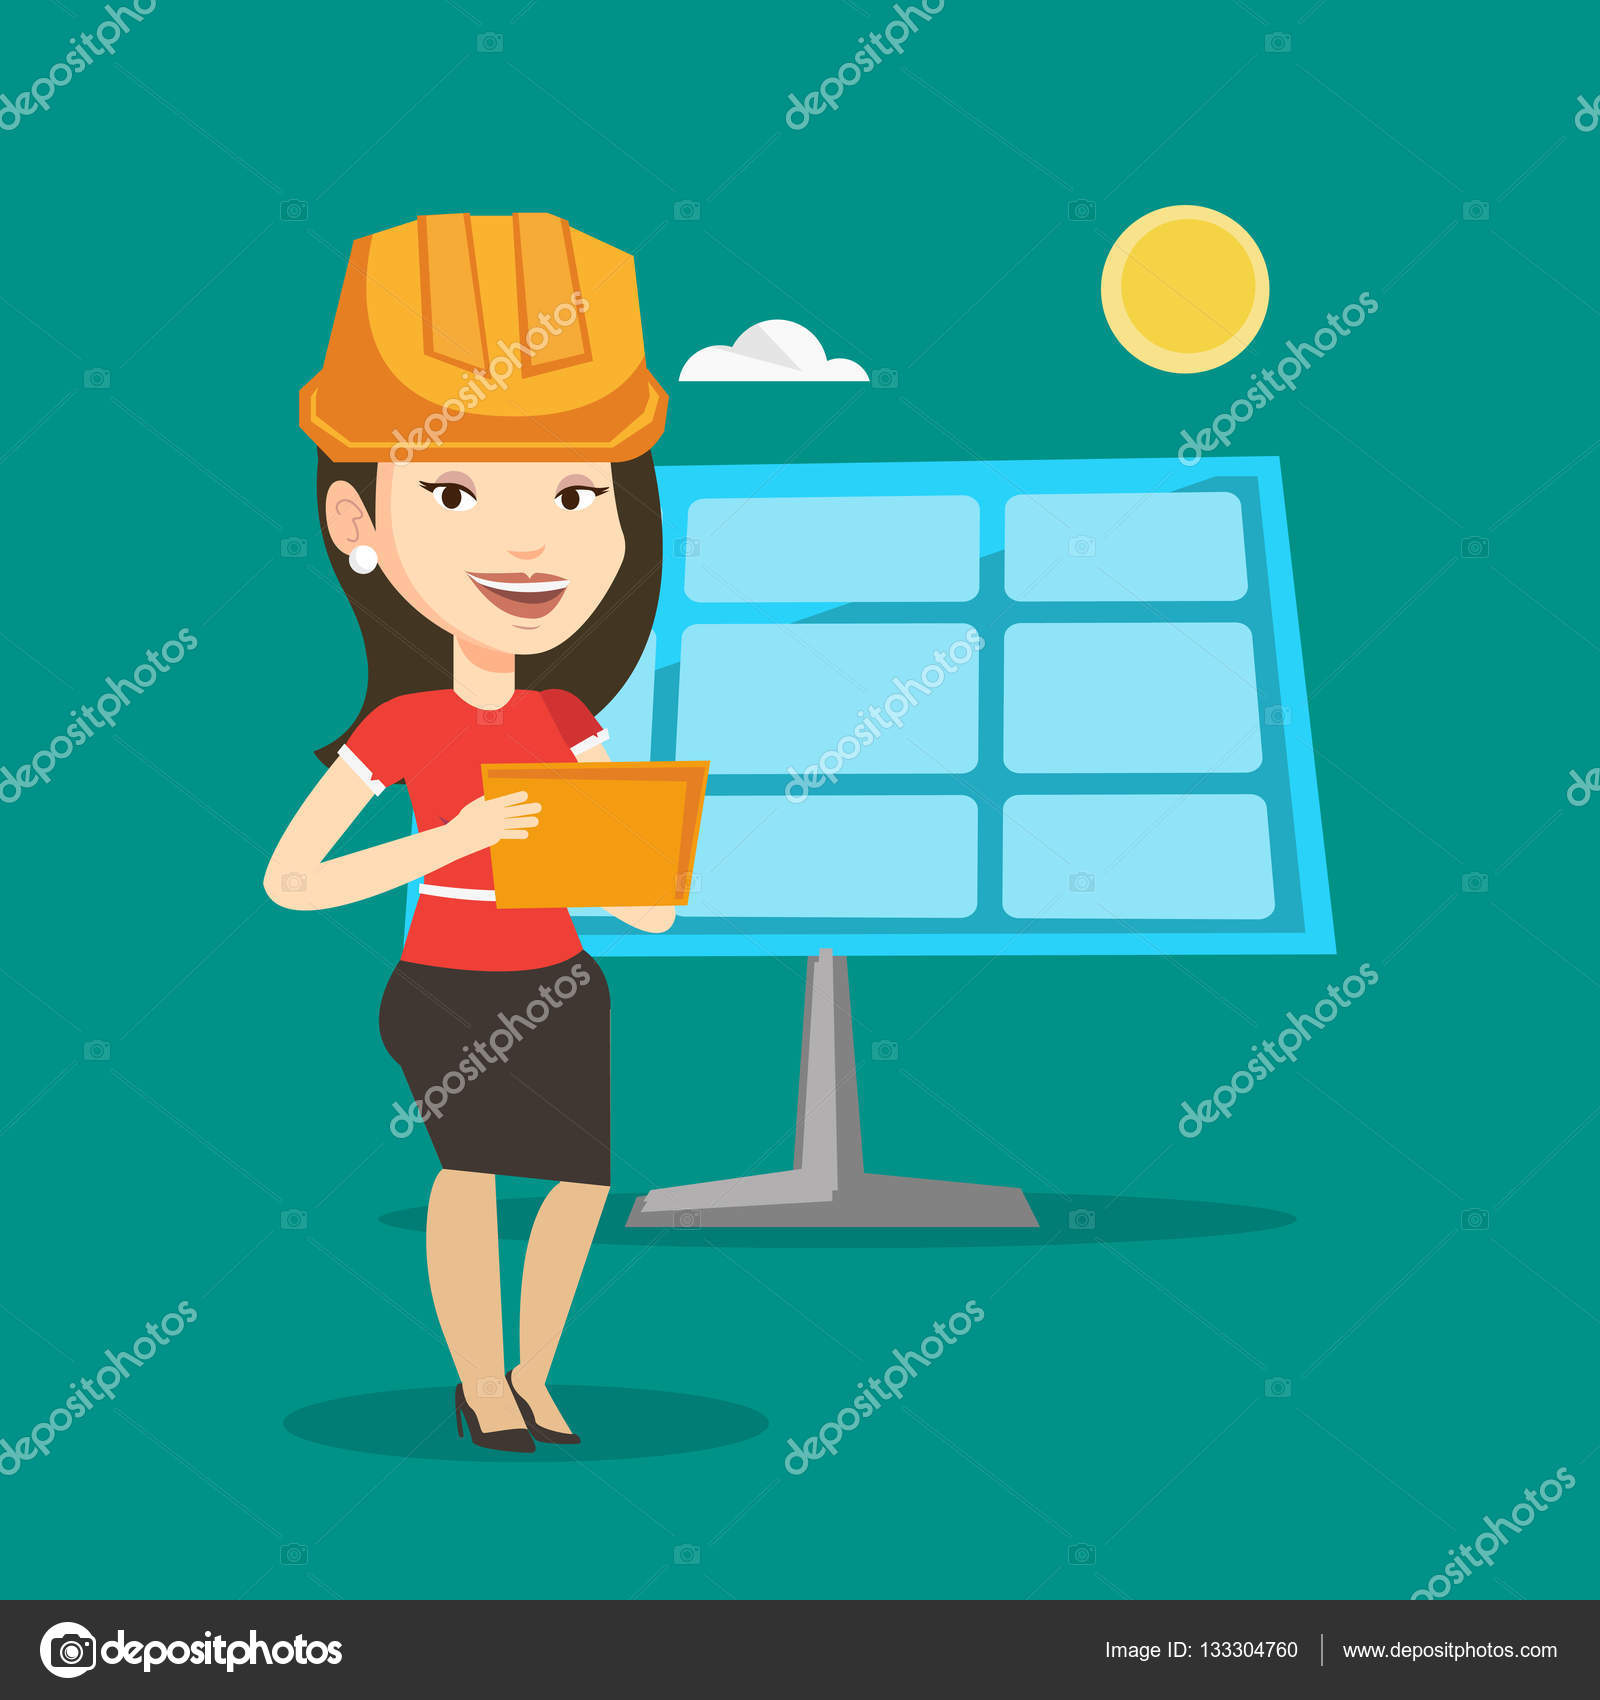 Female Worker Of Solar Power Plant Stock Vector Rastudio 133304760 Layout Design Caucasian Engineer In Hard Hat Checking Panel Setup Flat Illustration Square